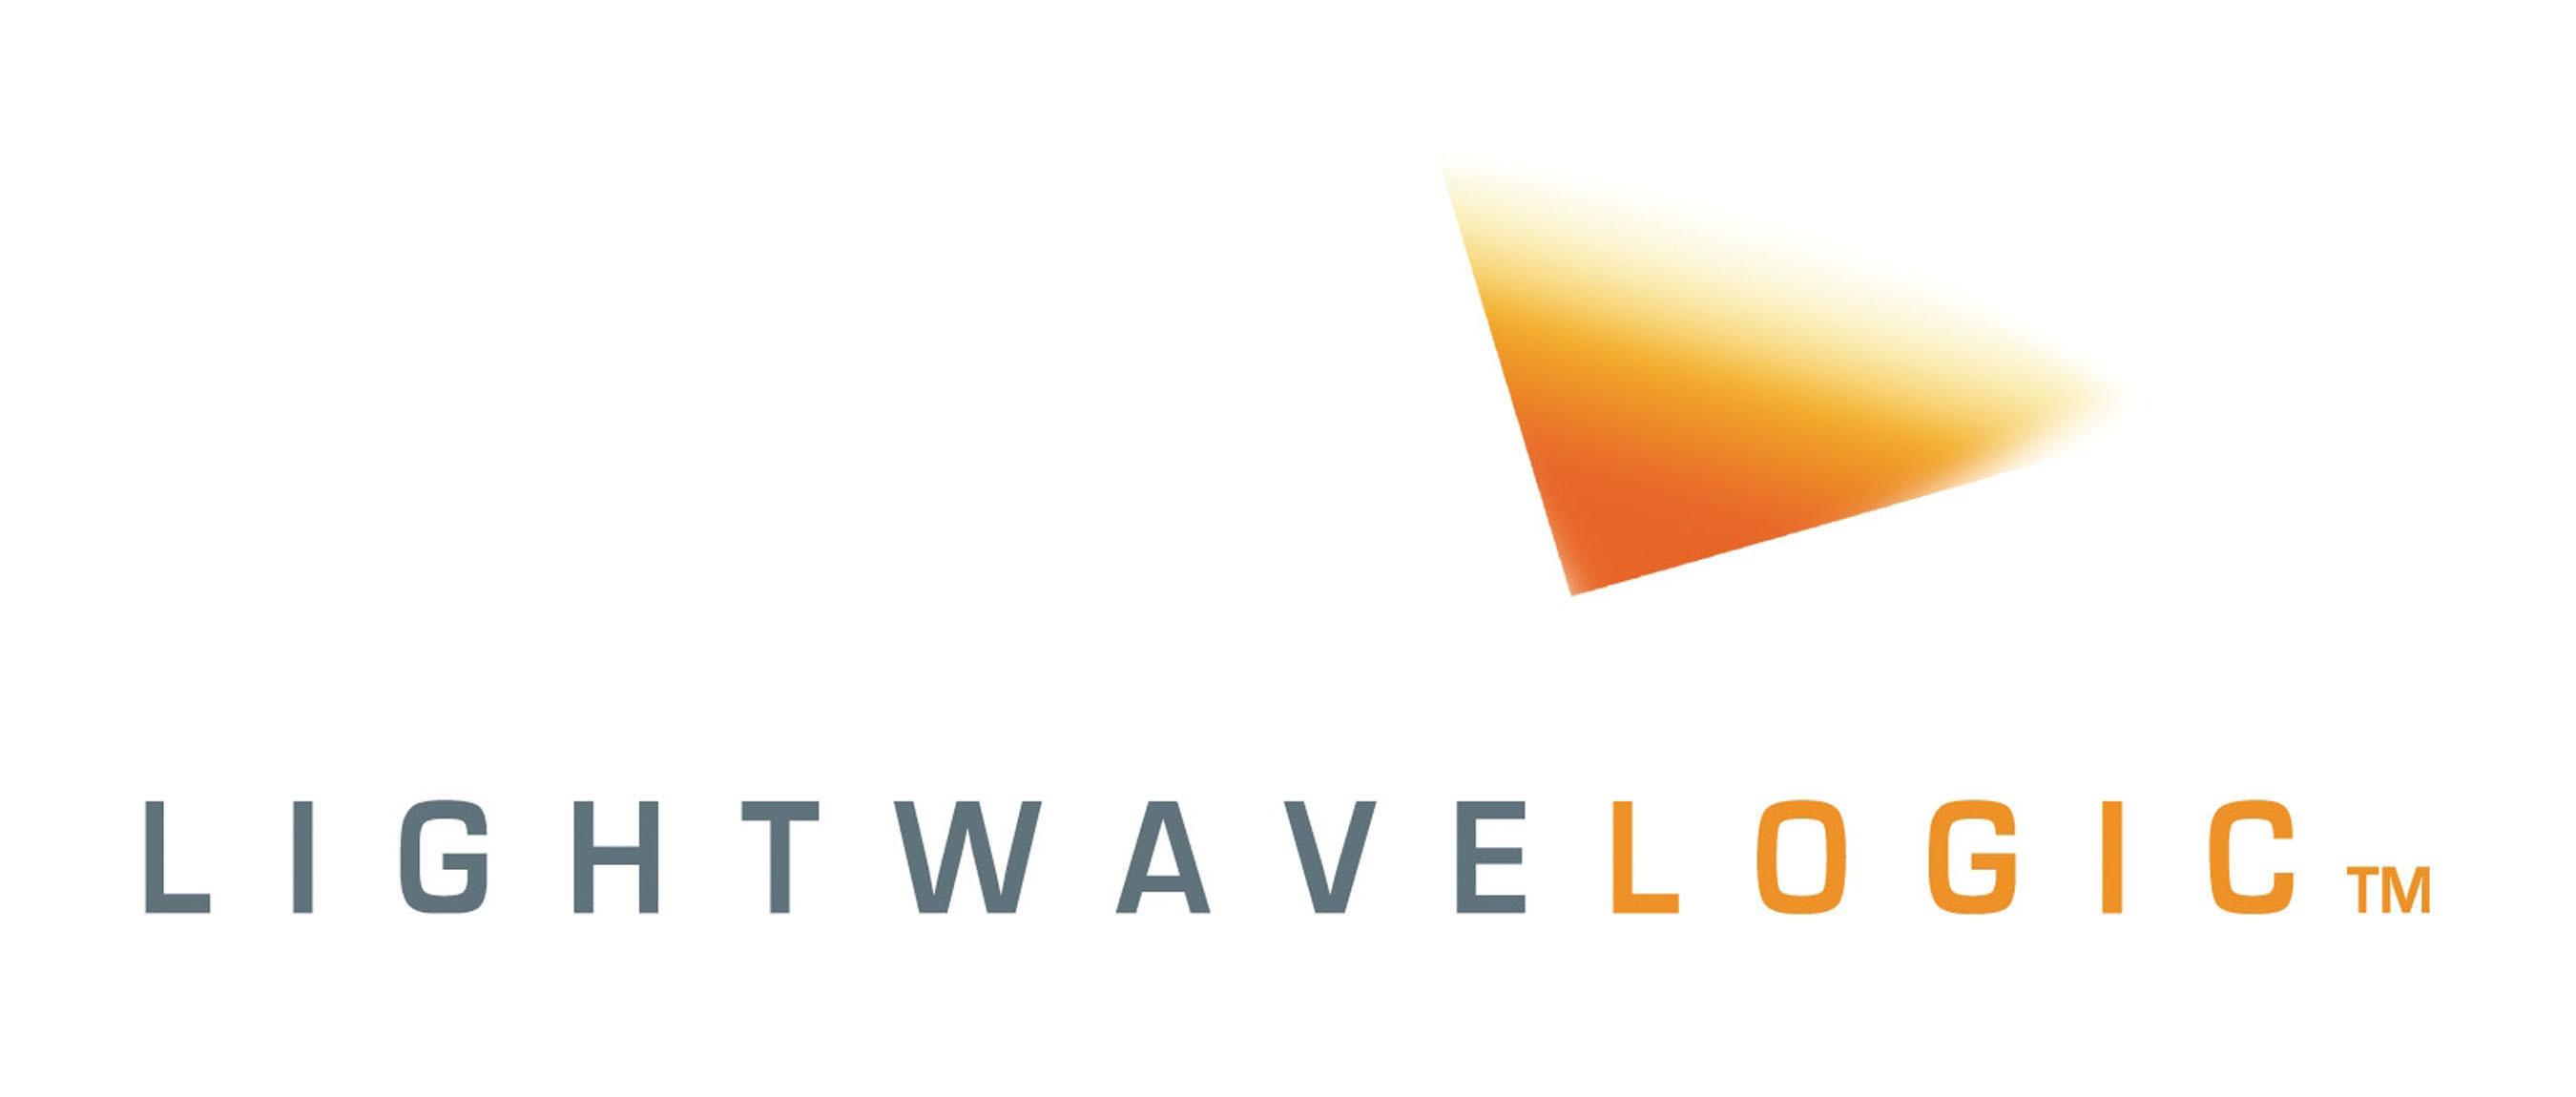 Lightwave Logic Logo.